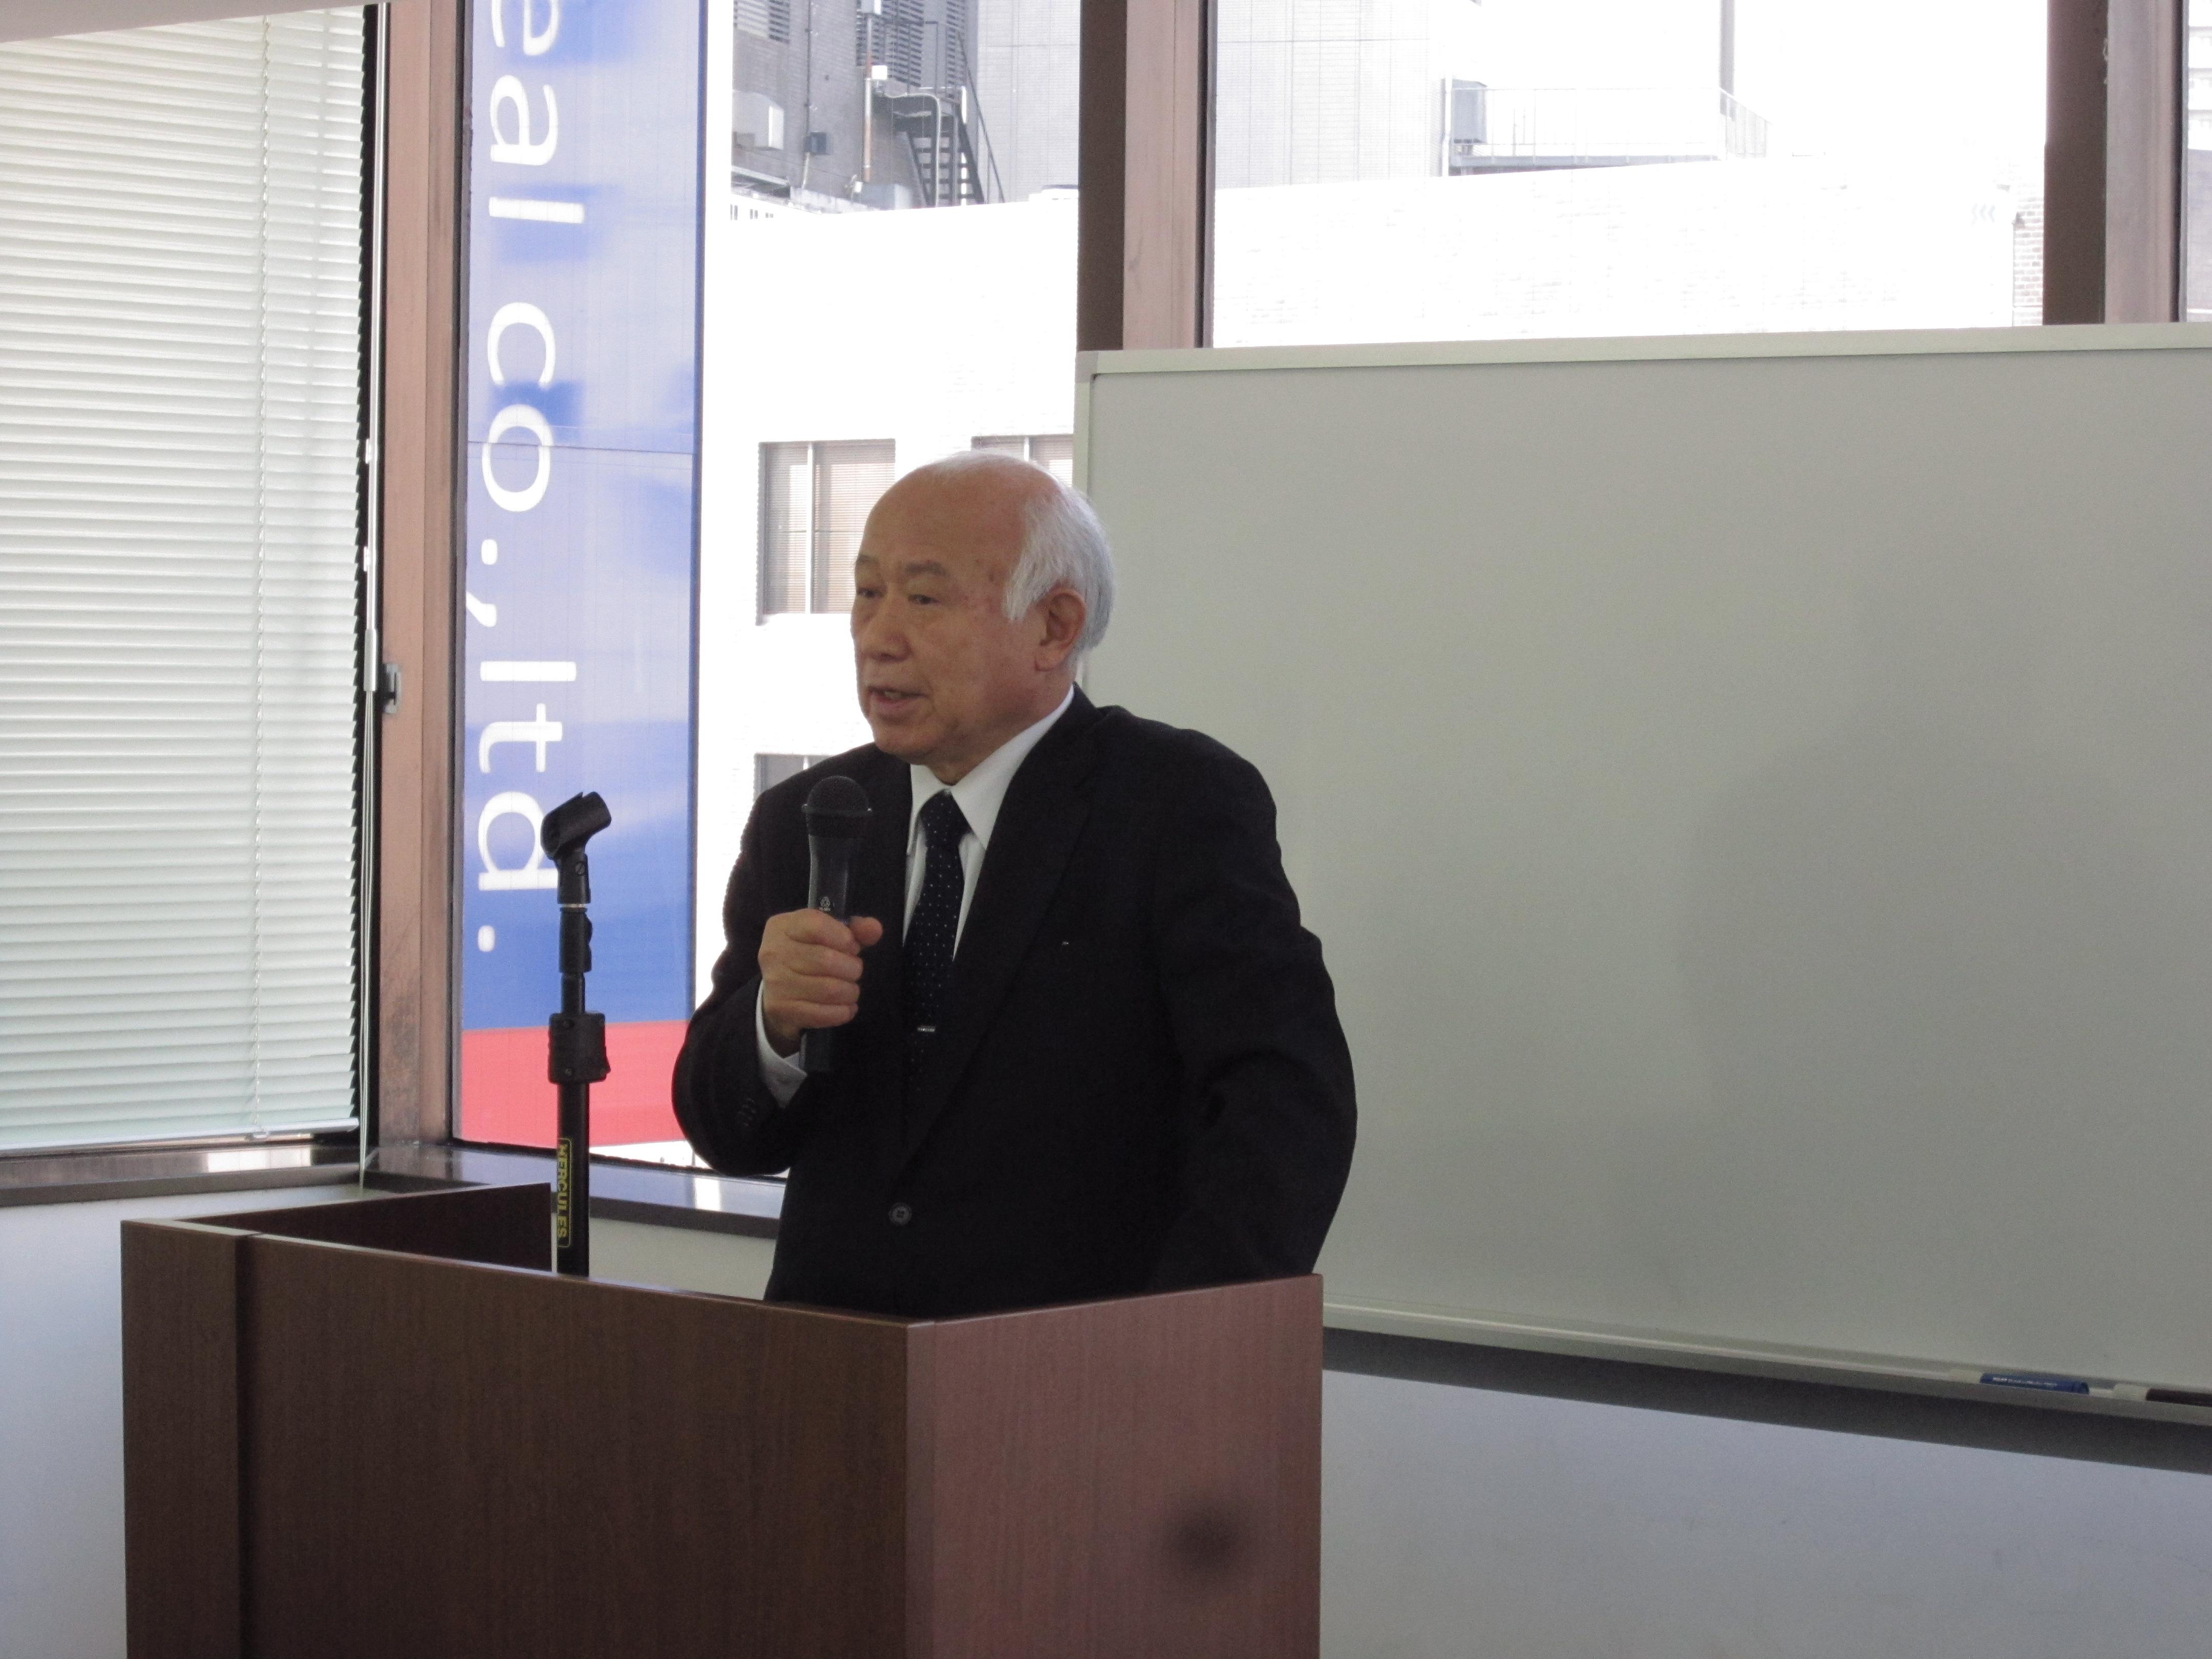 IMG 5594 - 4月1日東京思風塾の開催になります。